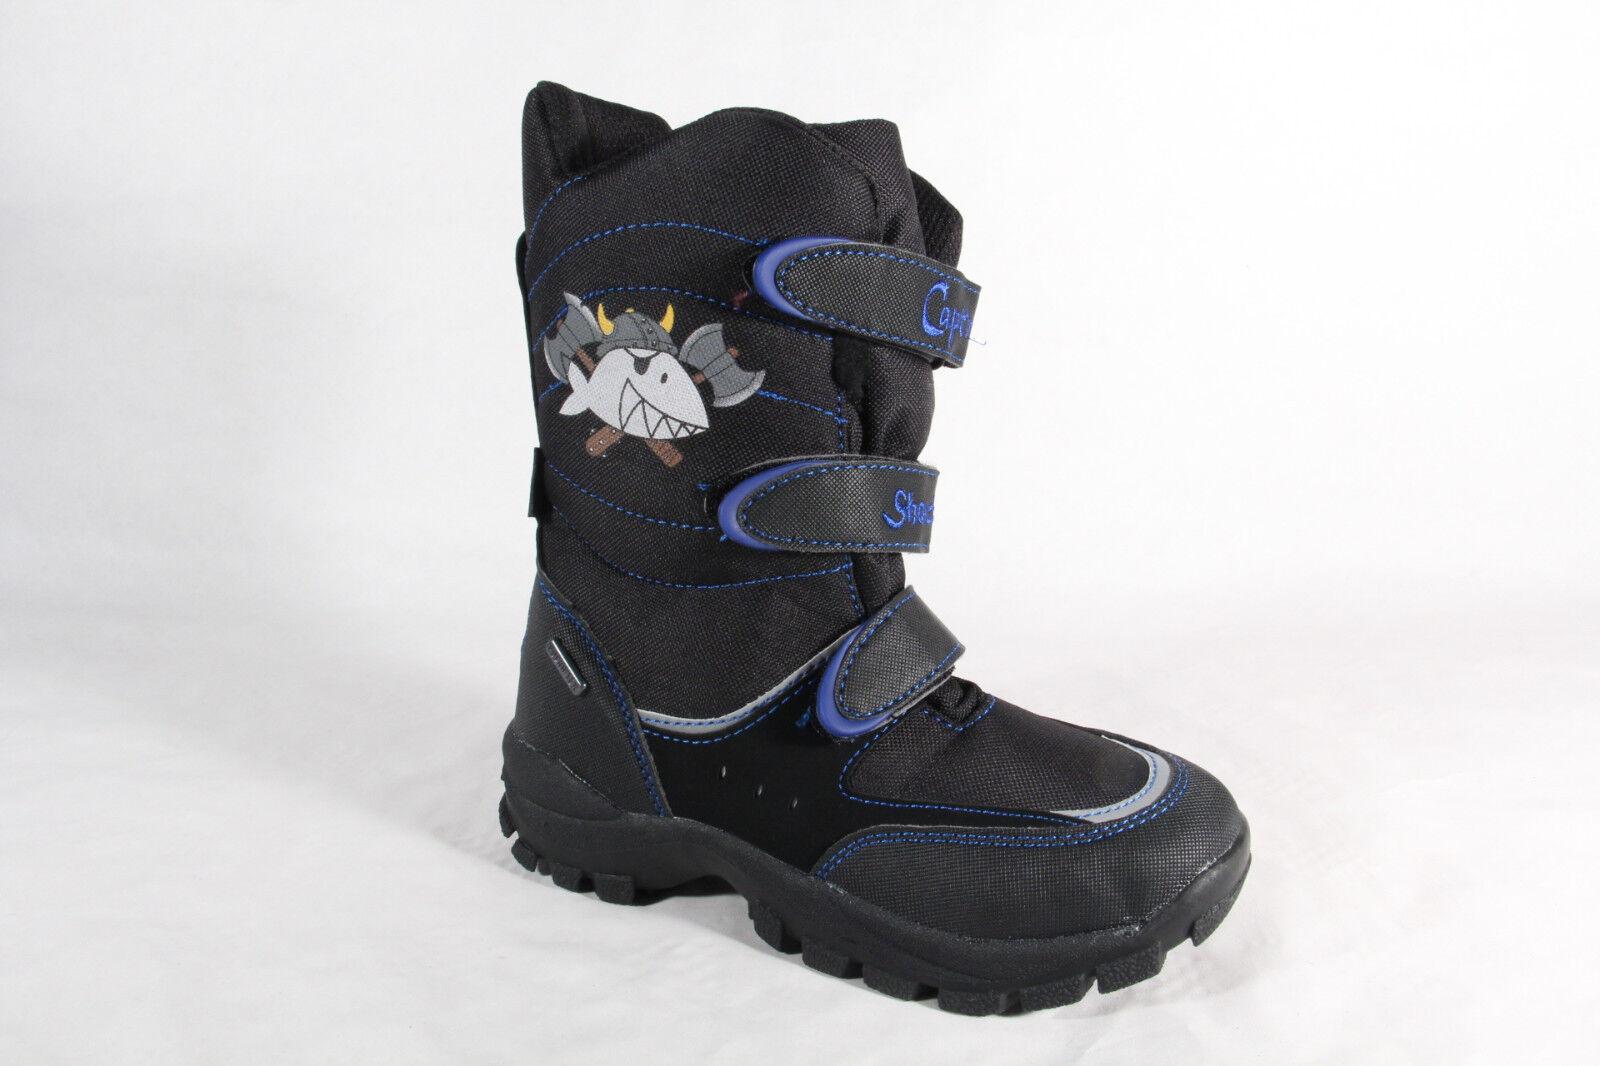 Capt'n Sharky Tex Stiefel Stiefel Winterstiefel schwarz blau 470539 NEU